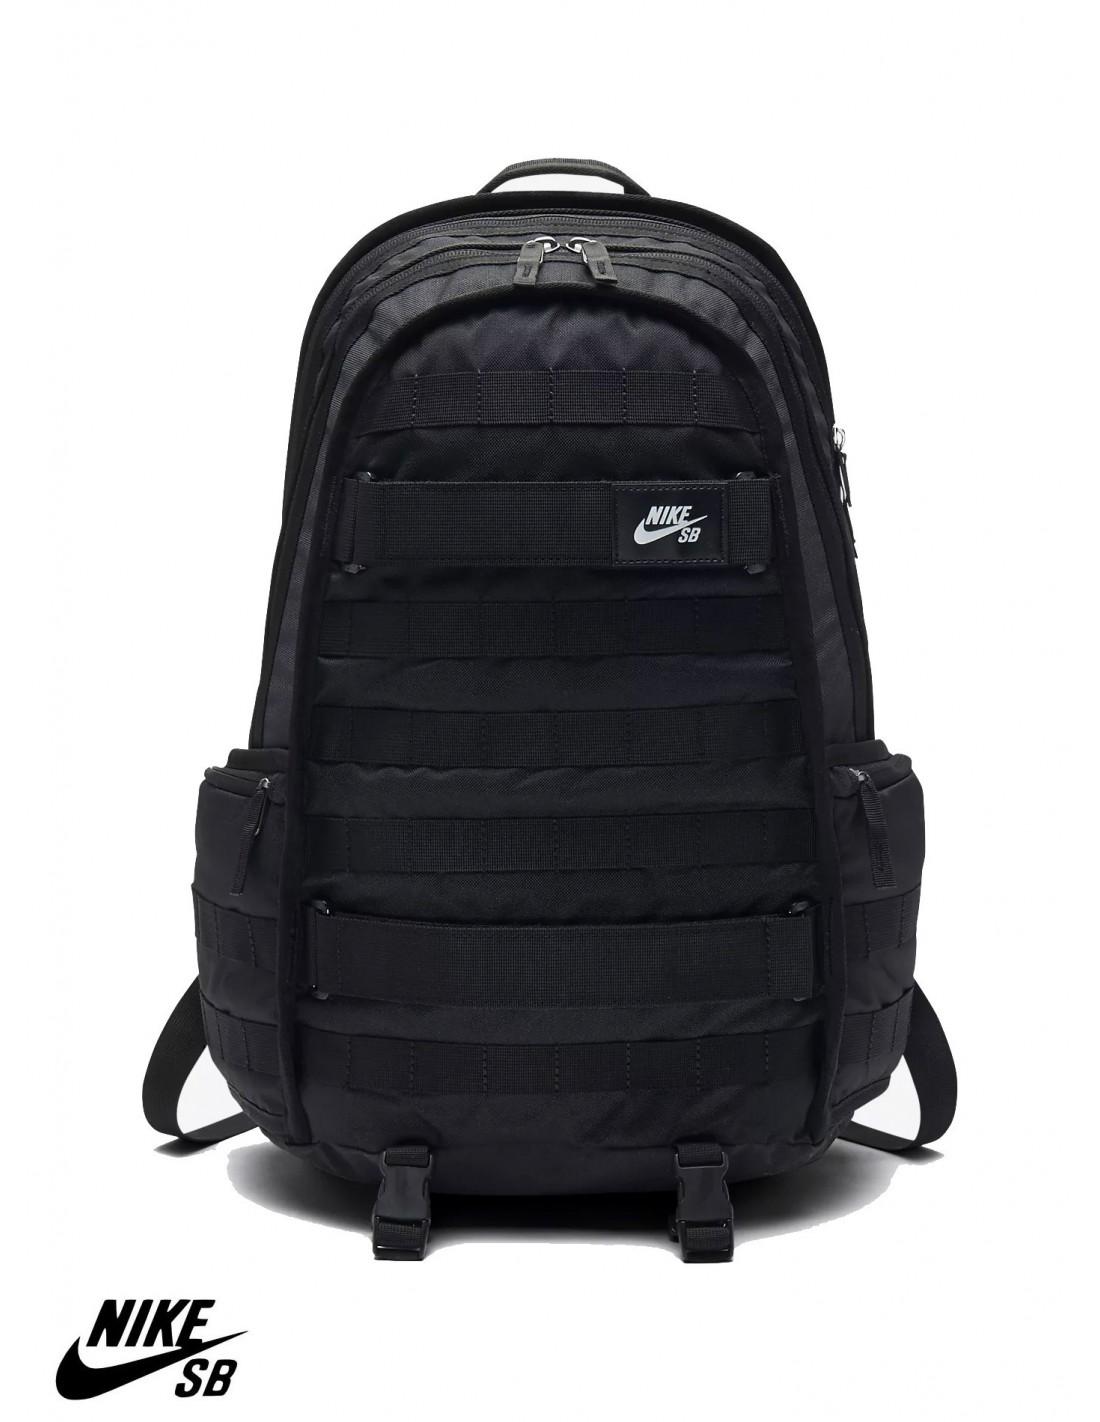 Más que nada abdomen Quagga  Sac à dos Nike SB RPM Noir